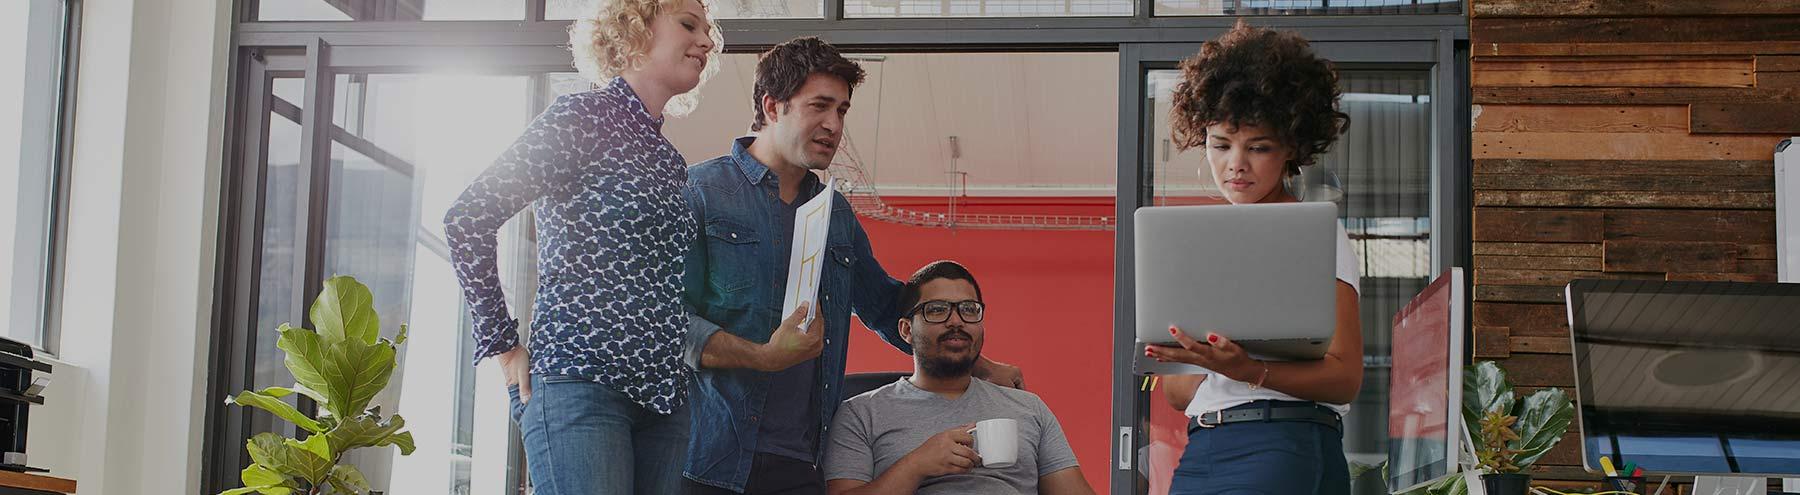 Kickstarter: Sharing Economy in Motion